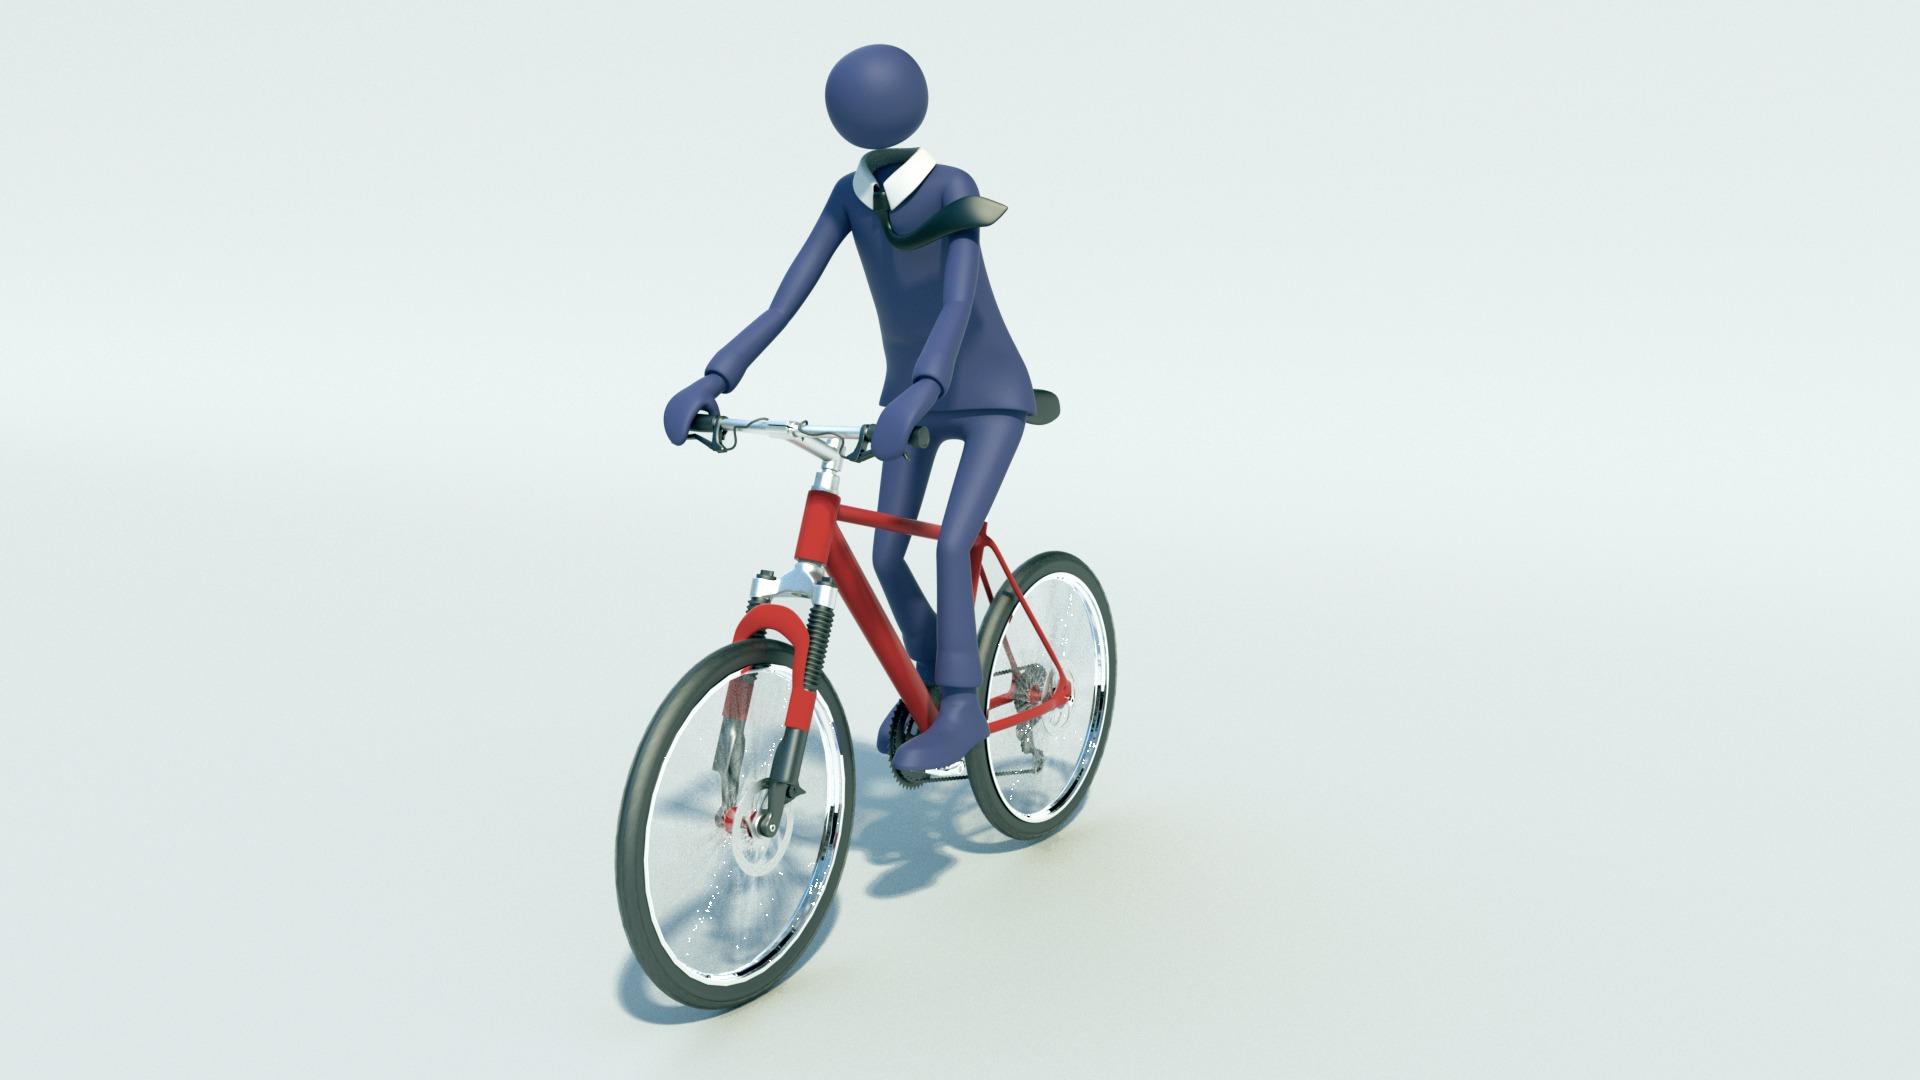 Unternehmer am Fahrrad